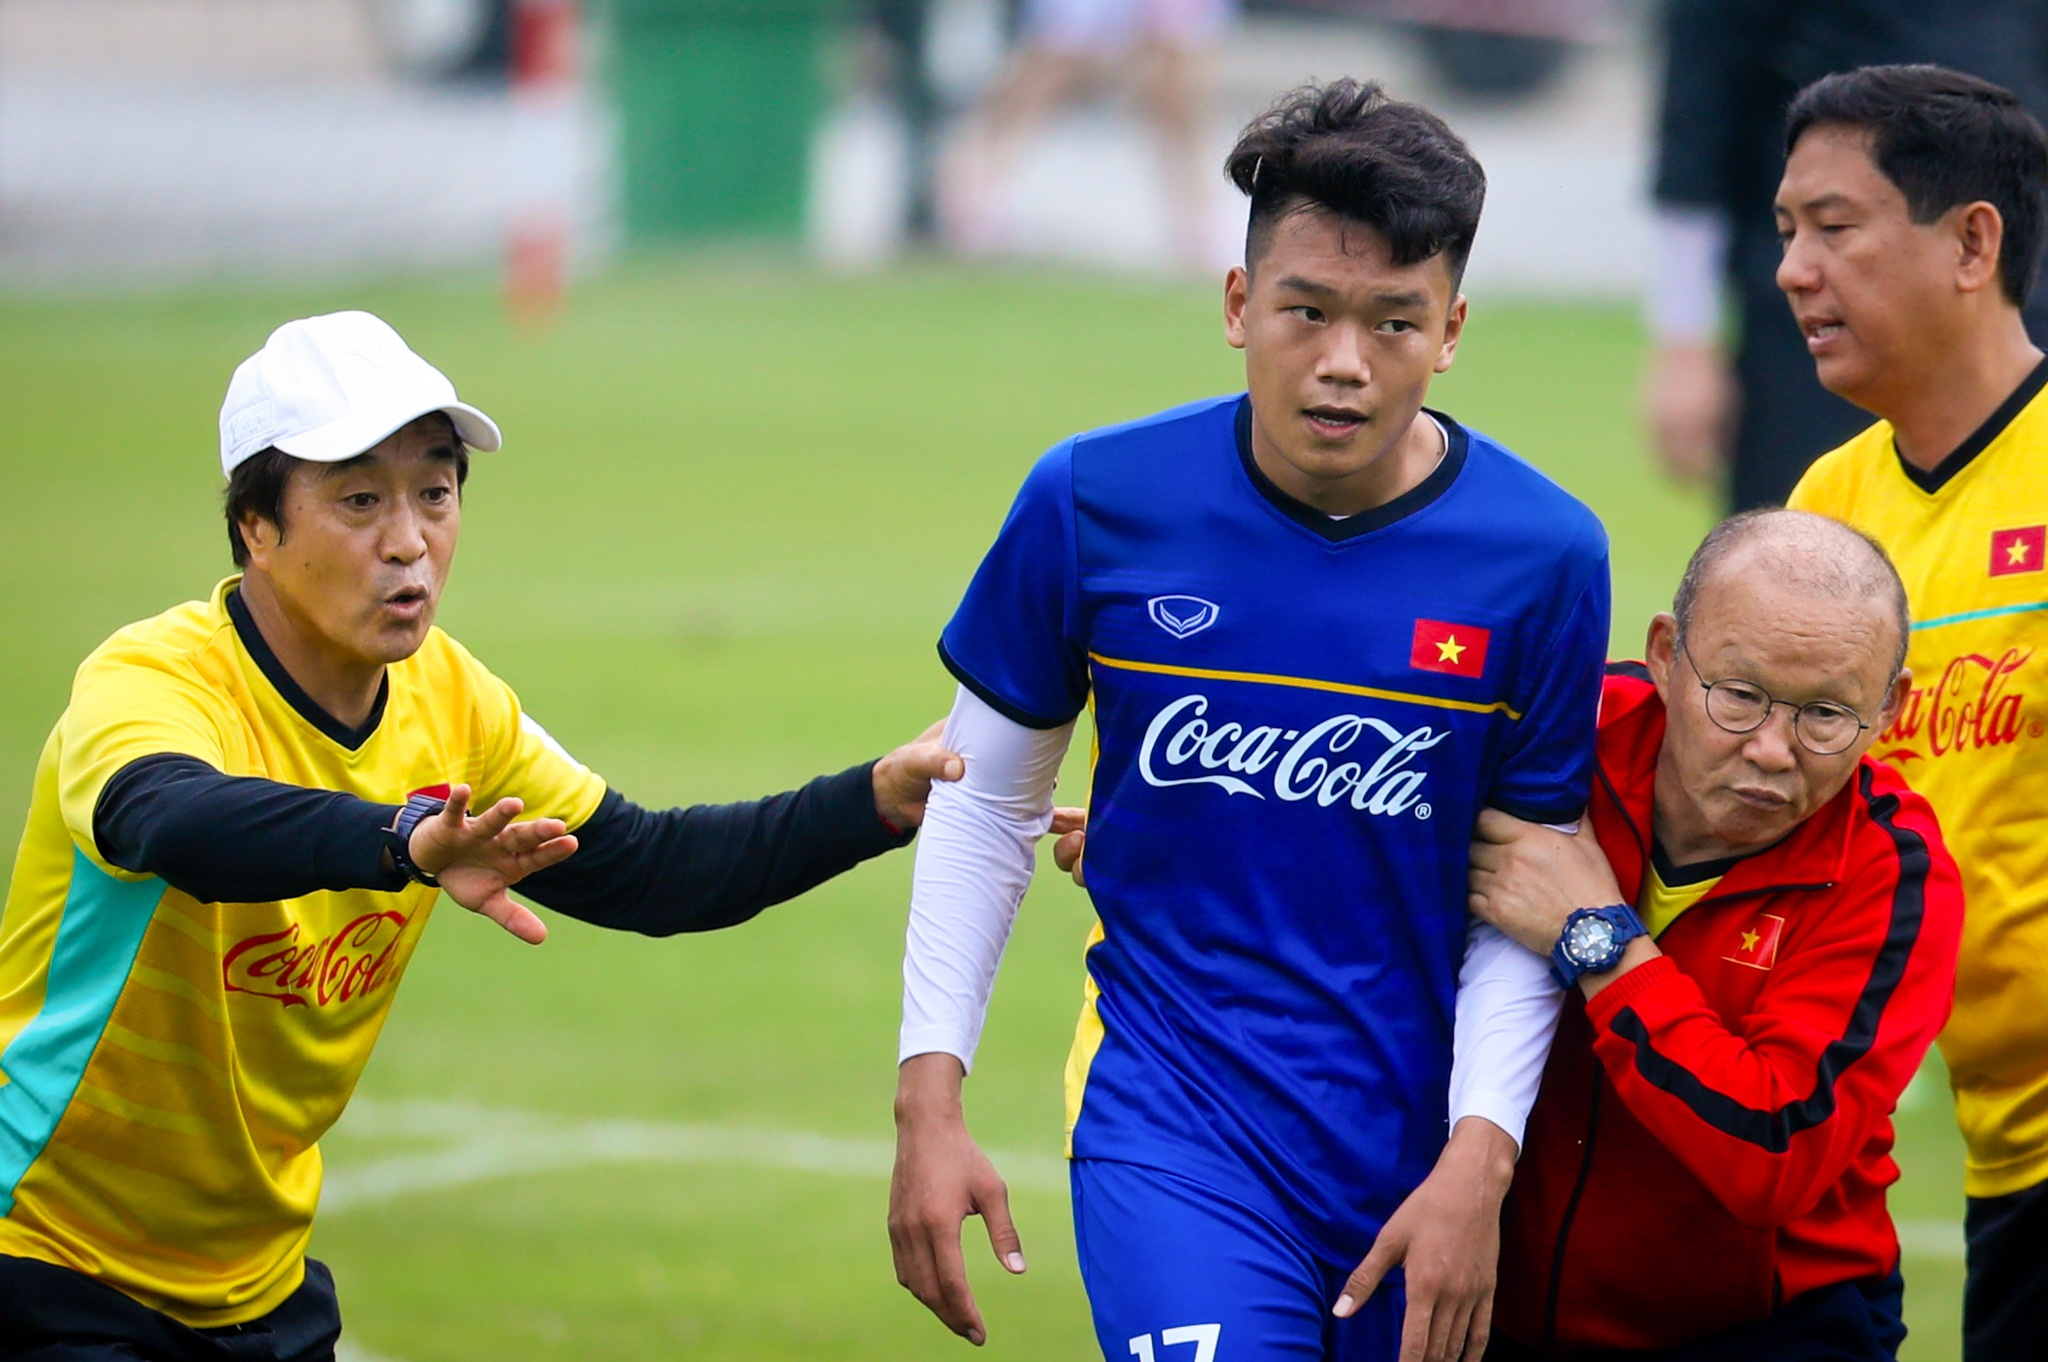 Nhin lai 2 nam cua HLV Park Hang-seo voi bong da Viet Nam hinh anh 2